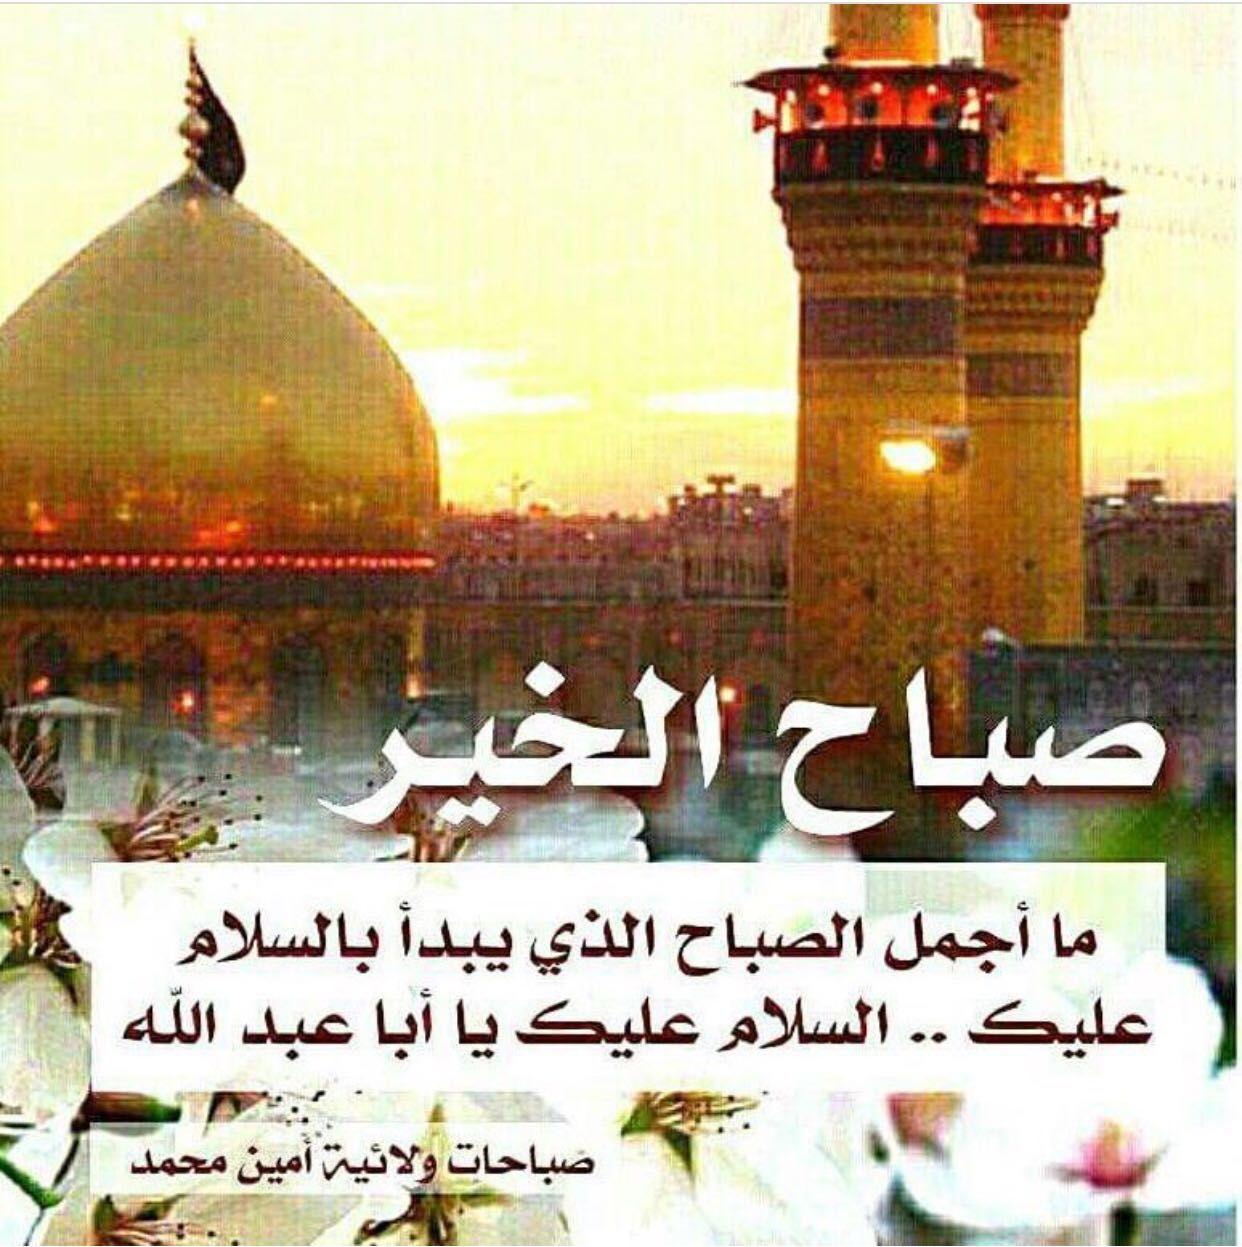 Pin By Ali علي On أهل البيت عليهم السلام Good Morning Greetings Islam